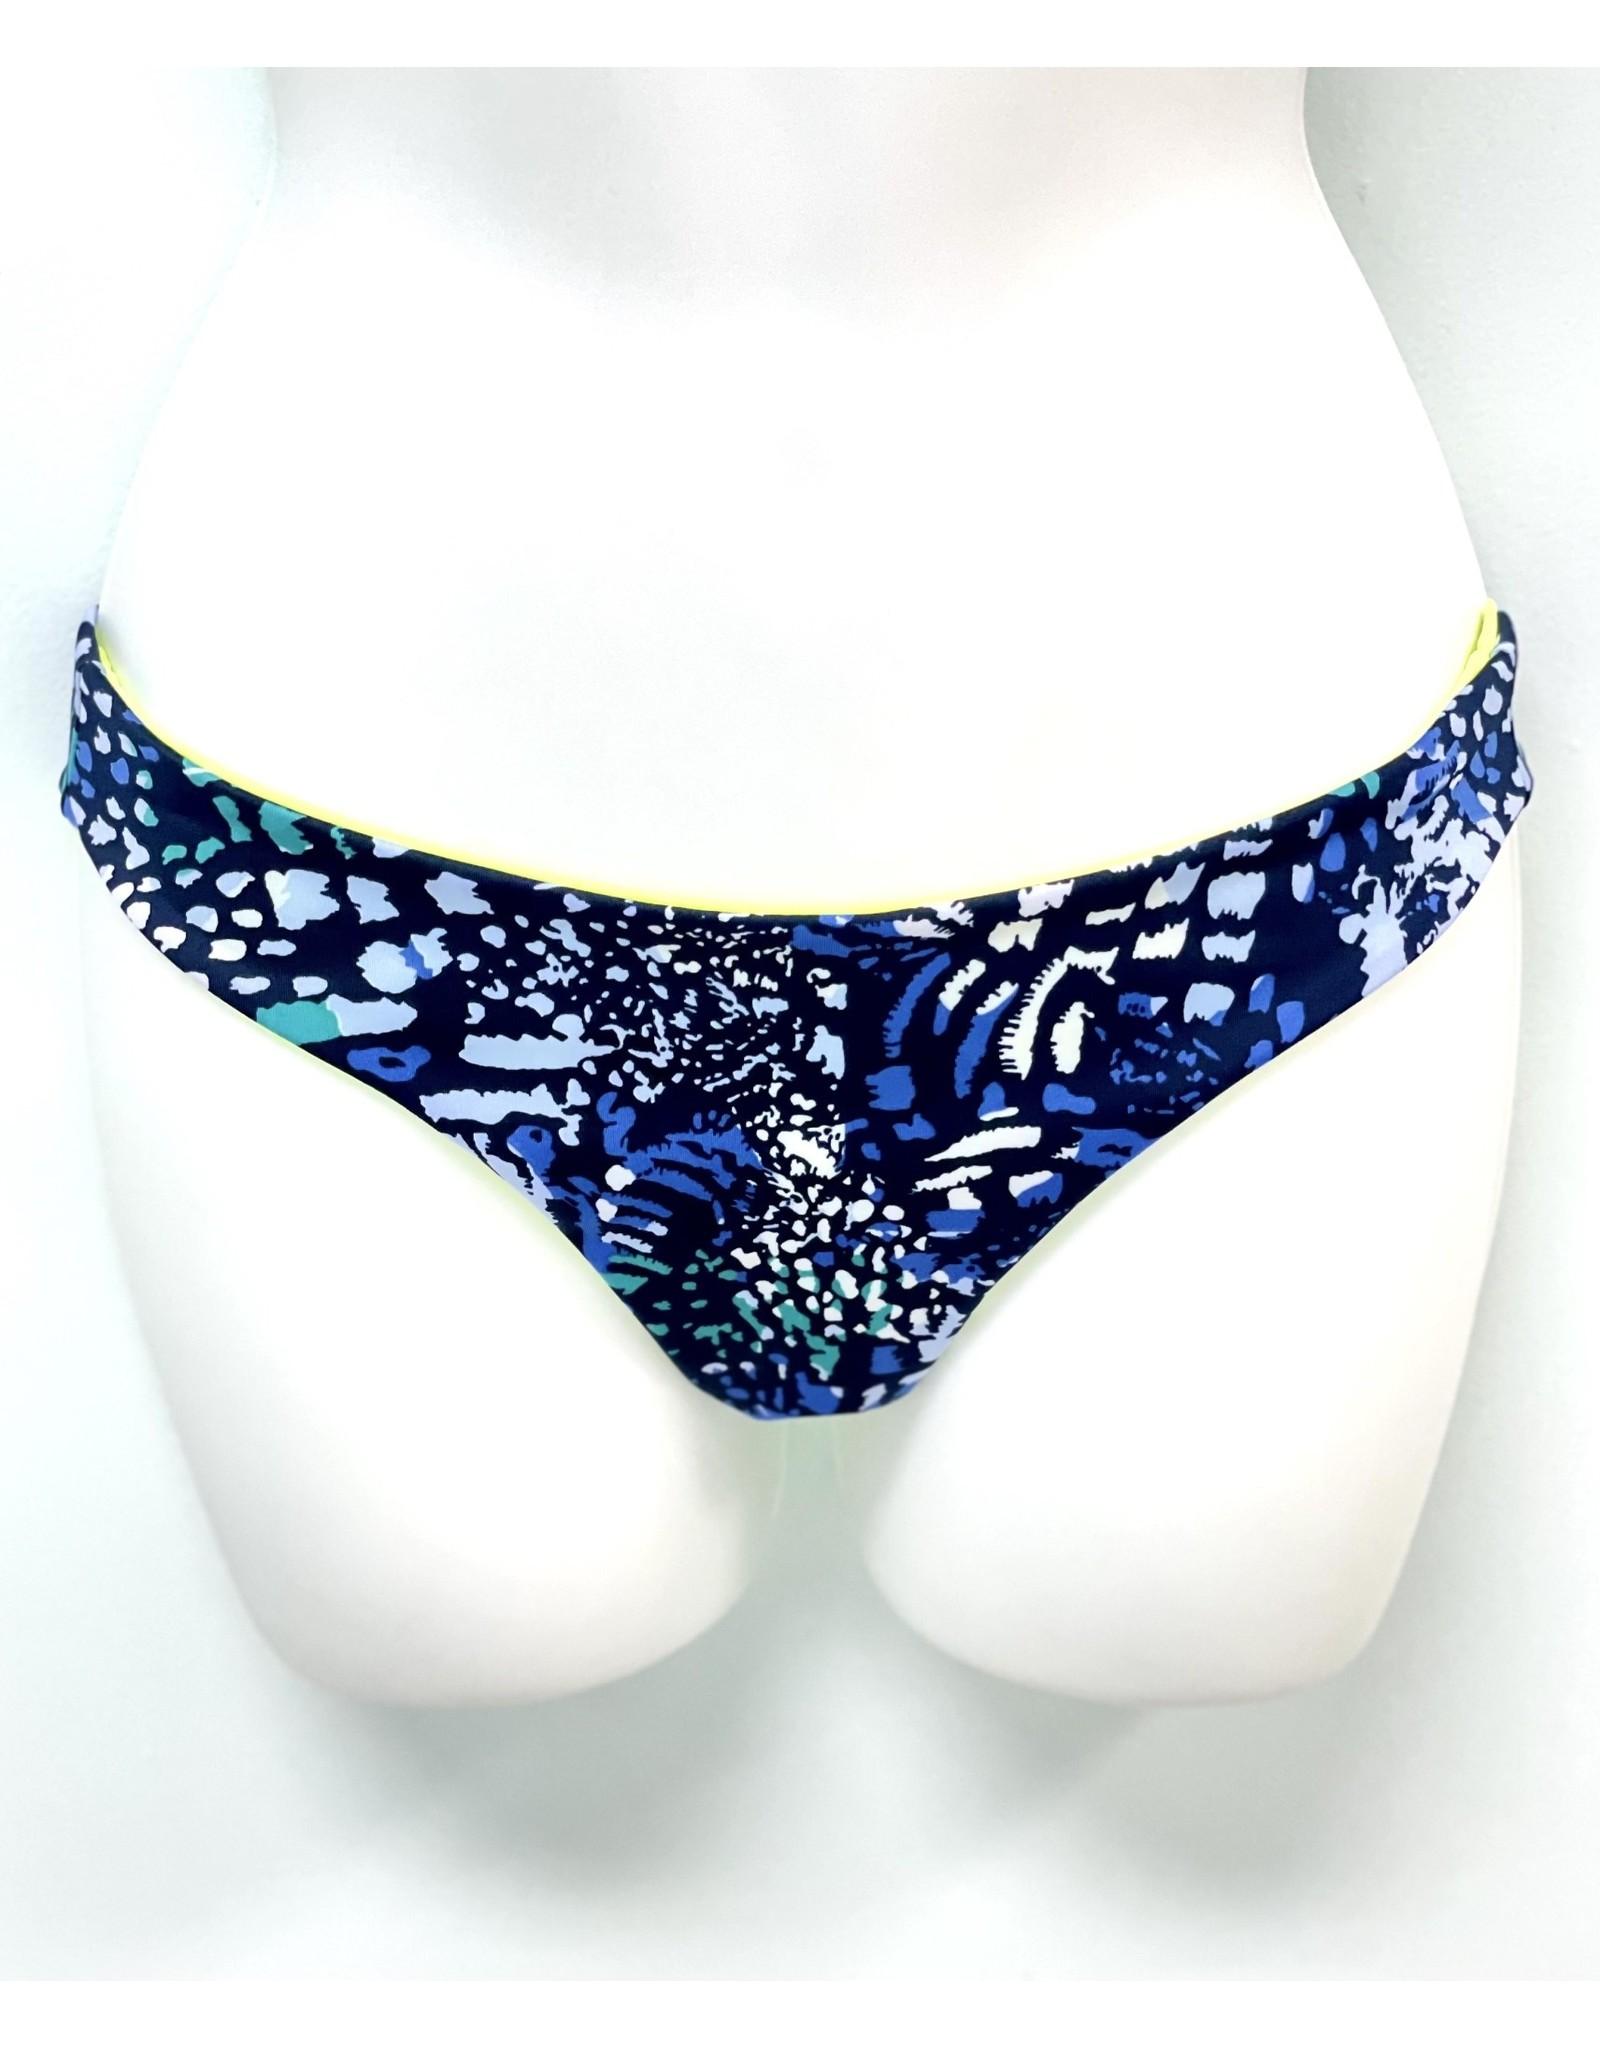 Summer Rae Designs Blue Leopard Sarasota Bottom